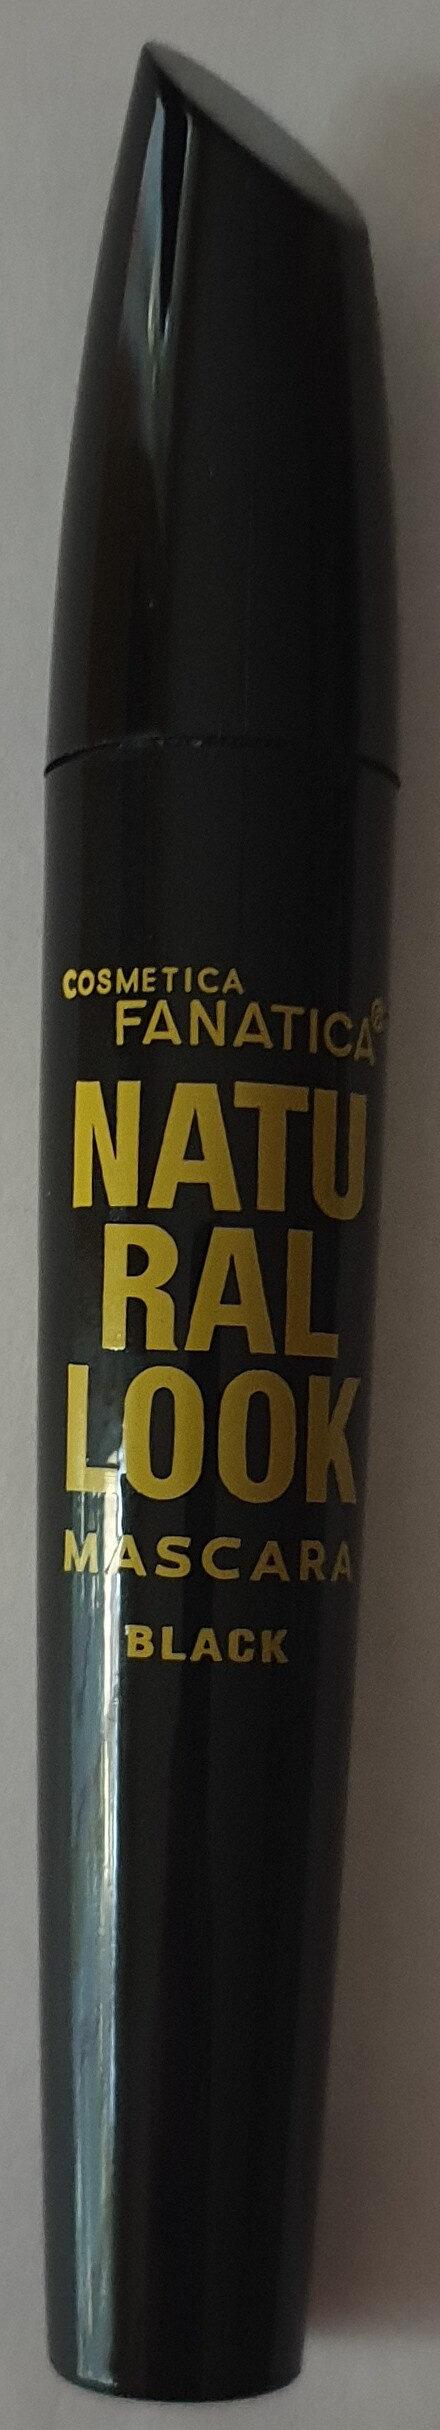 natu ral look mascara black - Product - de